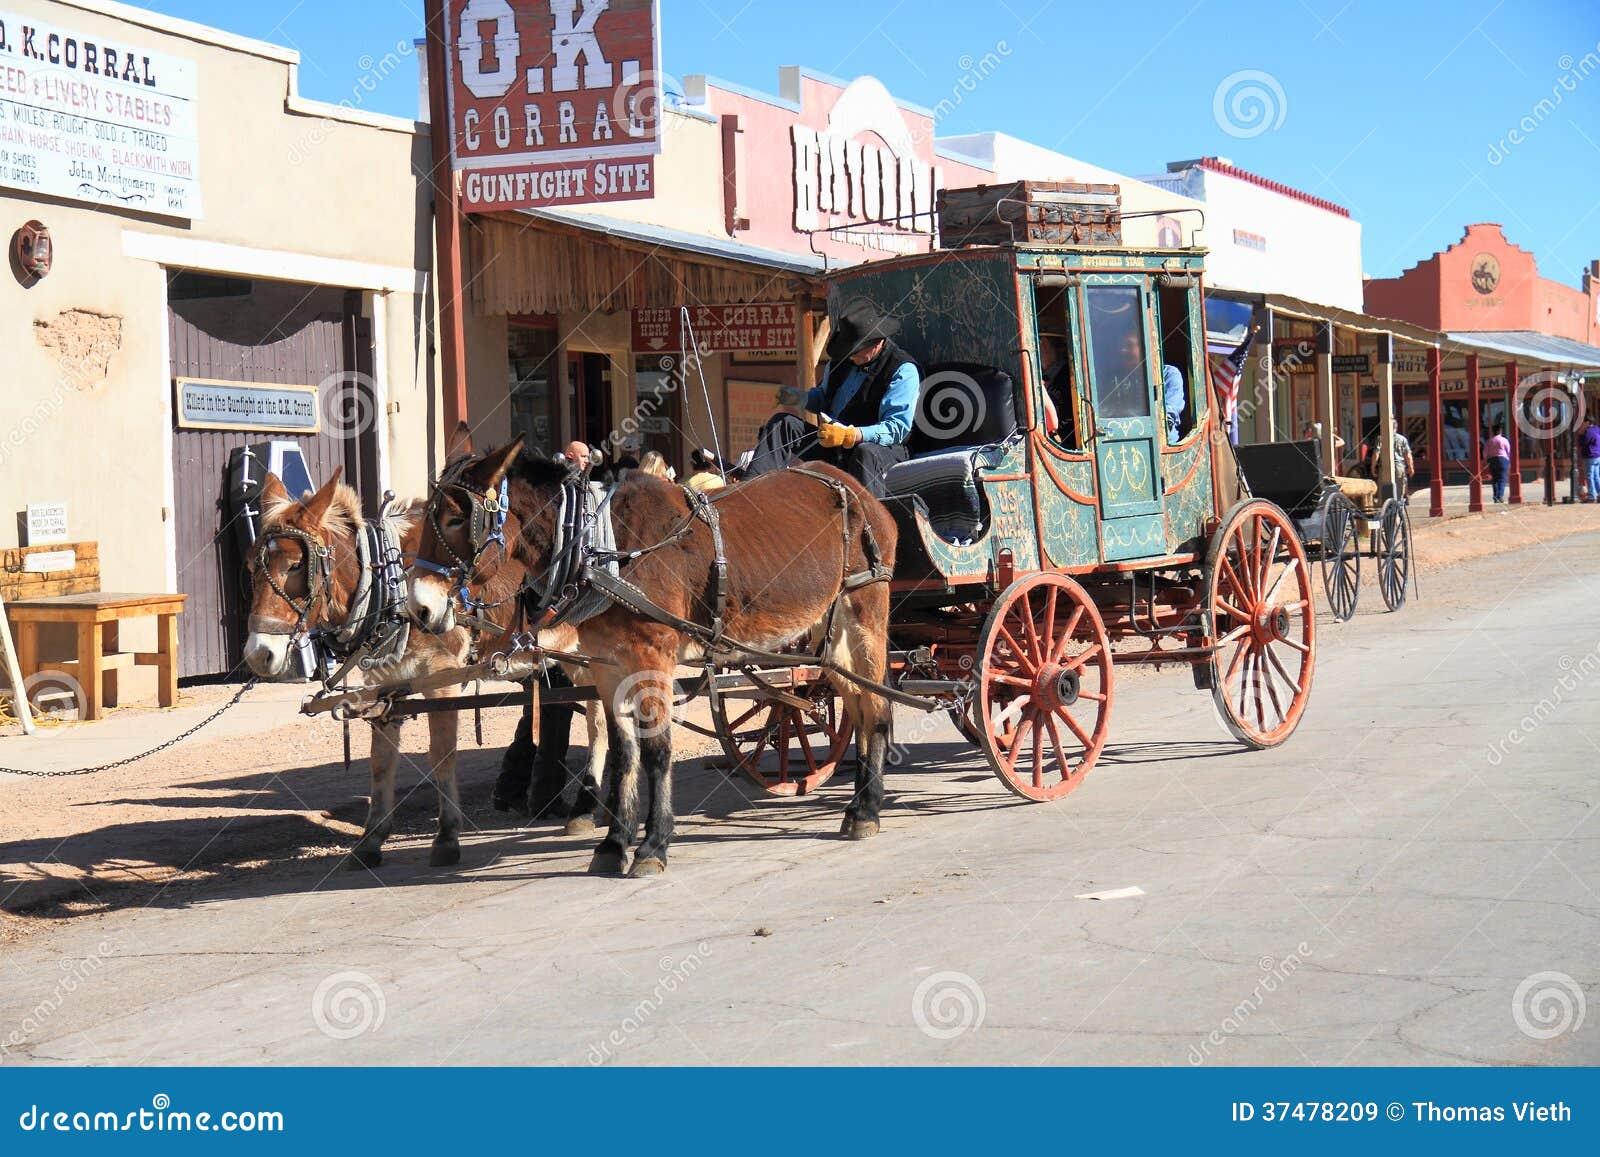 США, Аризона/надгробная плита: Старый запад - дилижанс